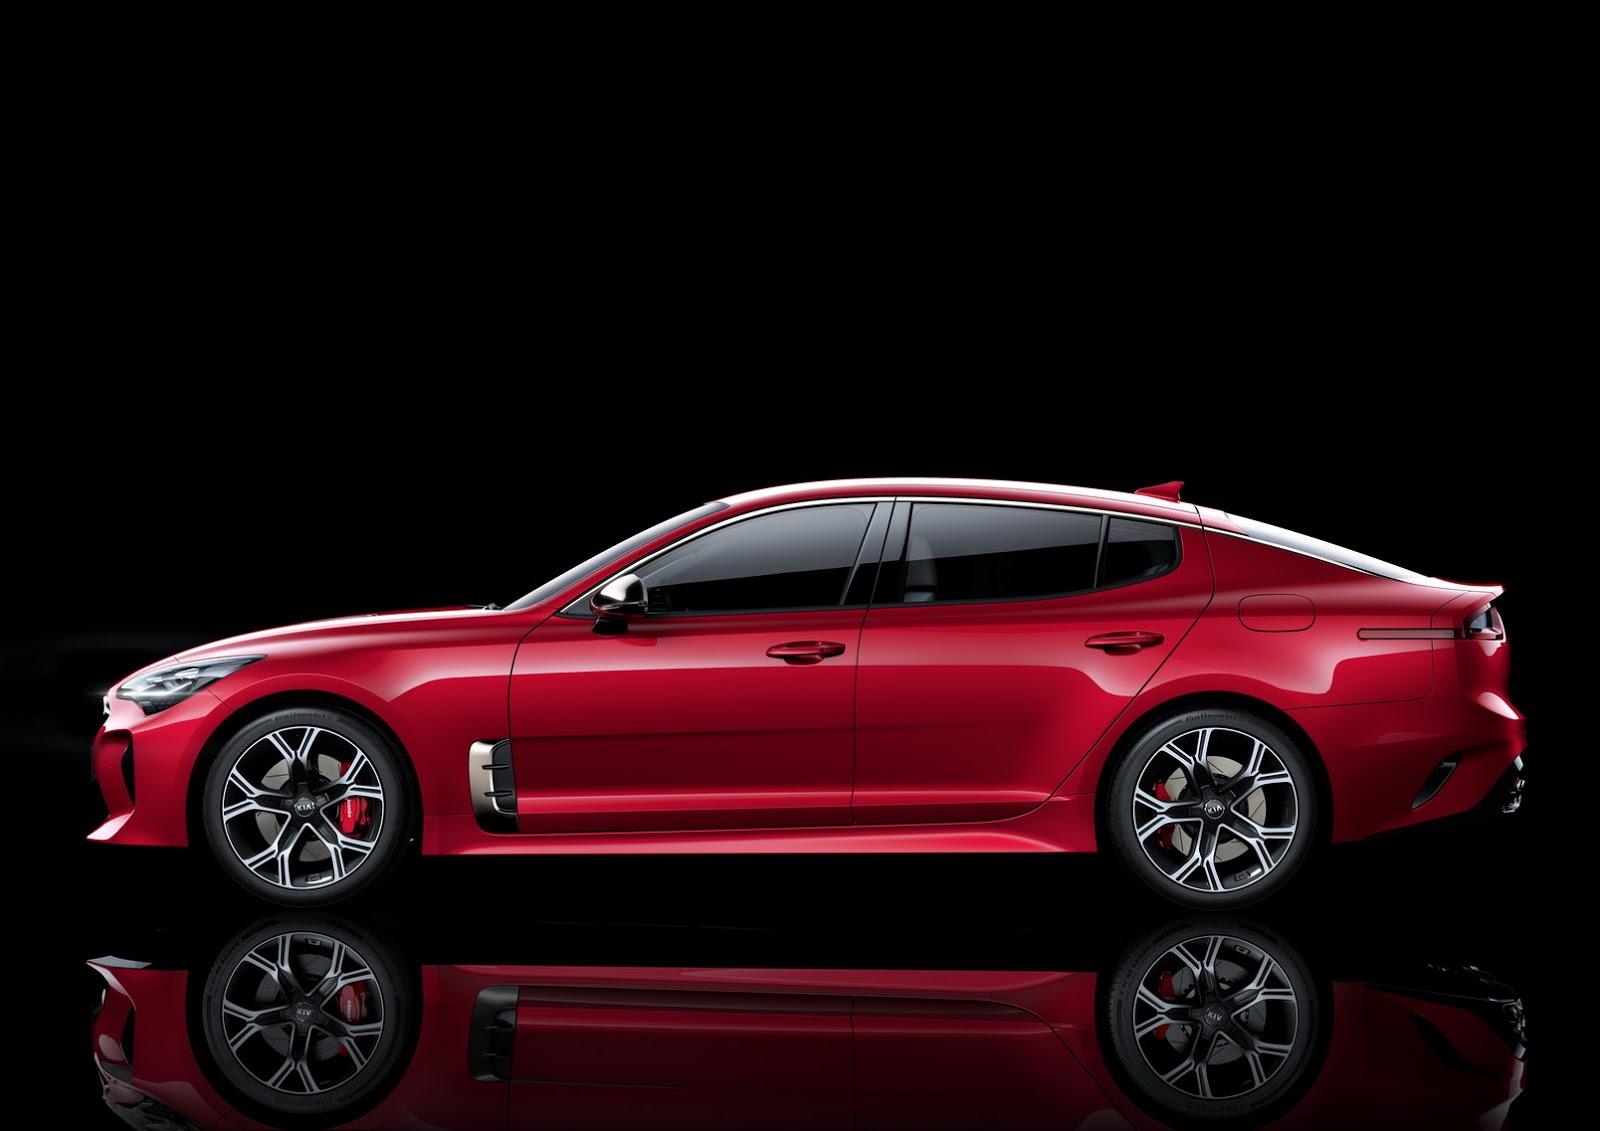 2018 Kia Stinger GT (5)